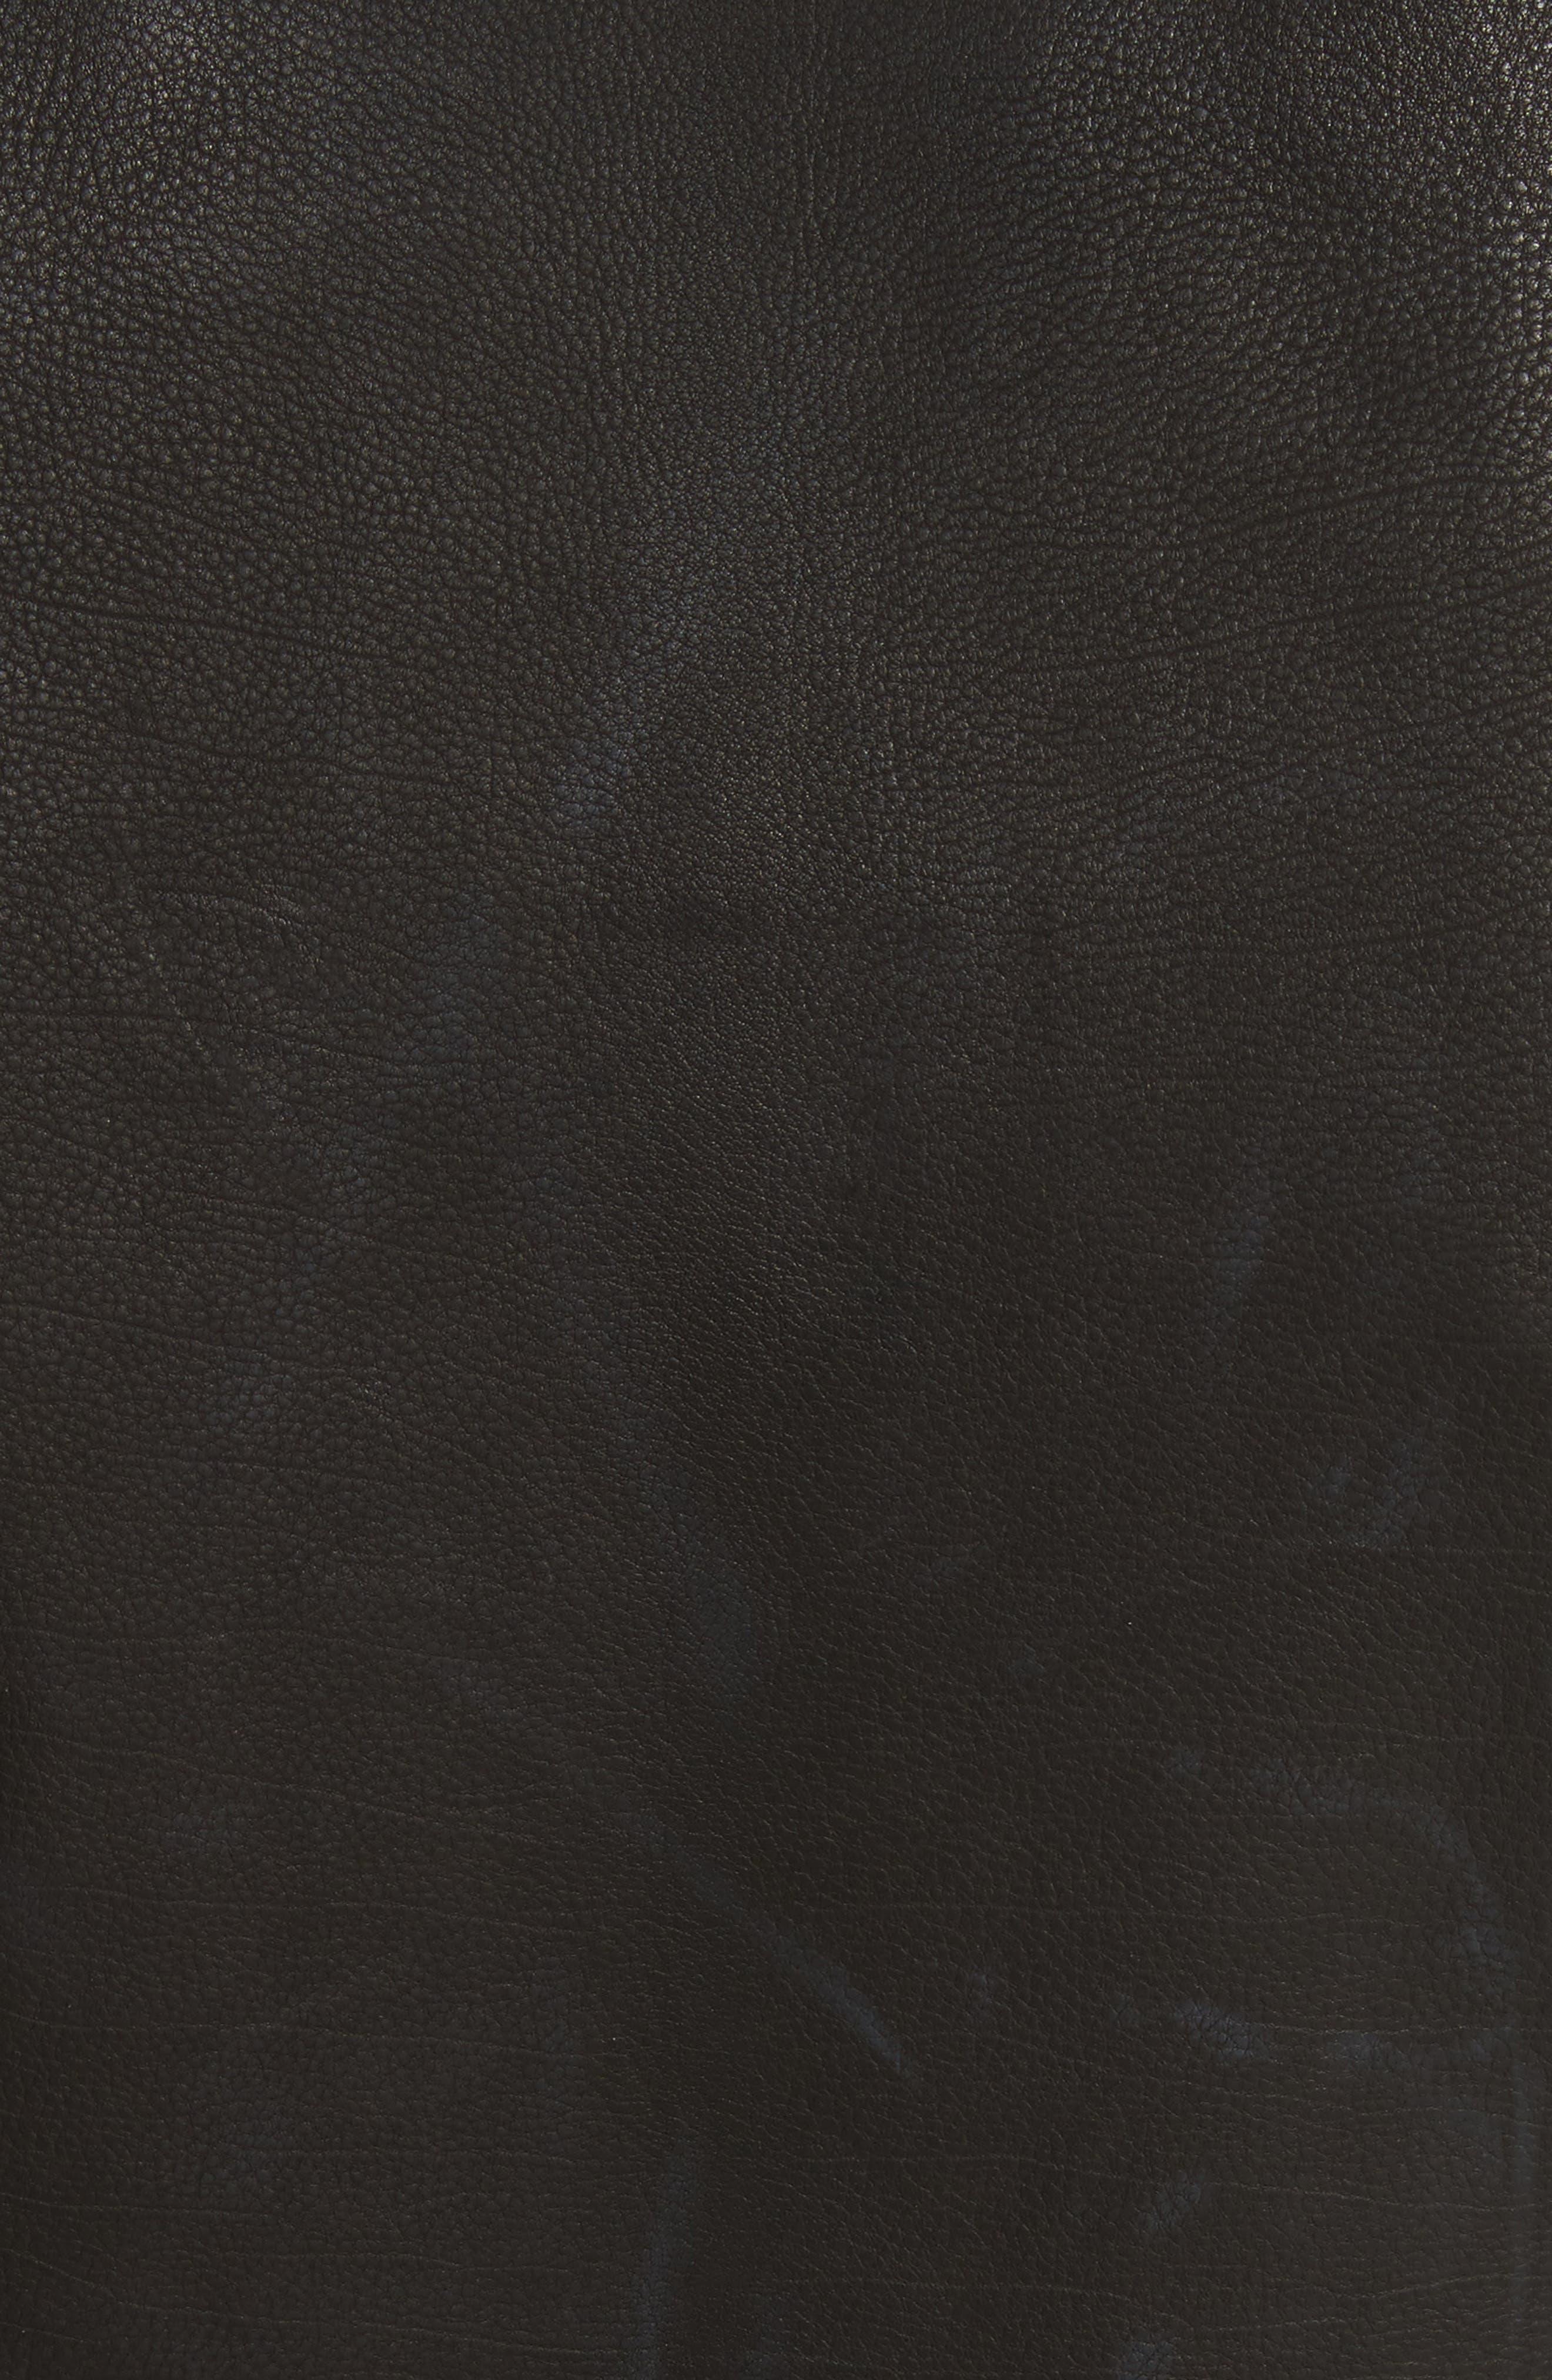 Calix Puff Shoulder Leather Moto Jacket,                             Alternate thumbnail 6, color,                             Black